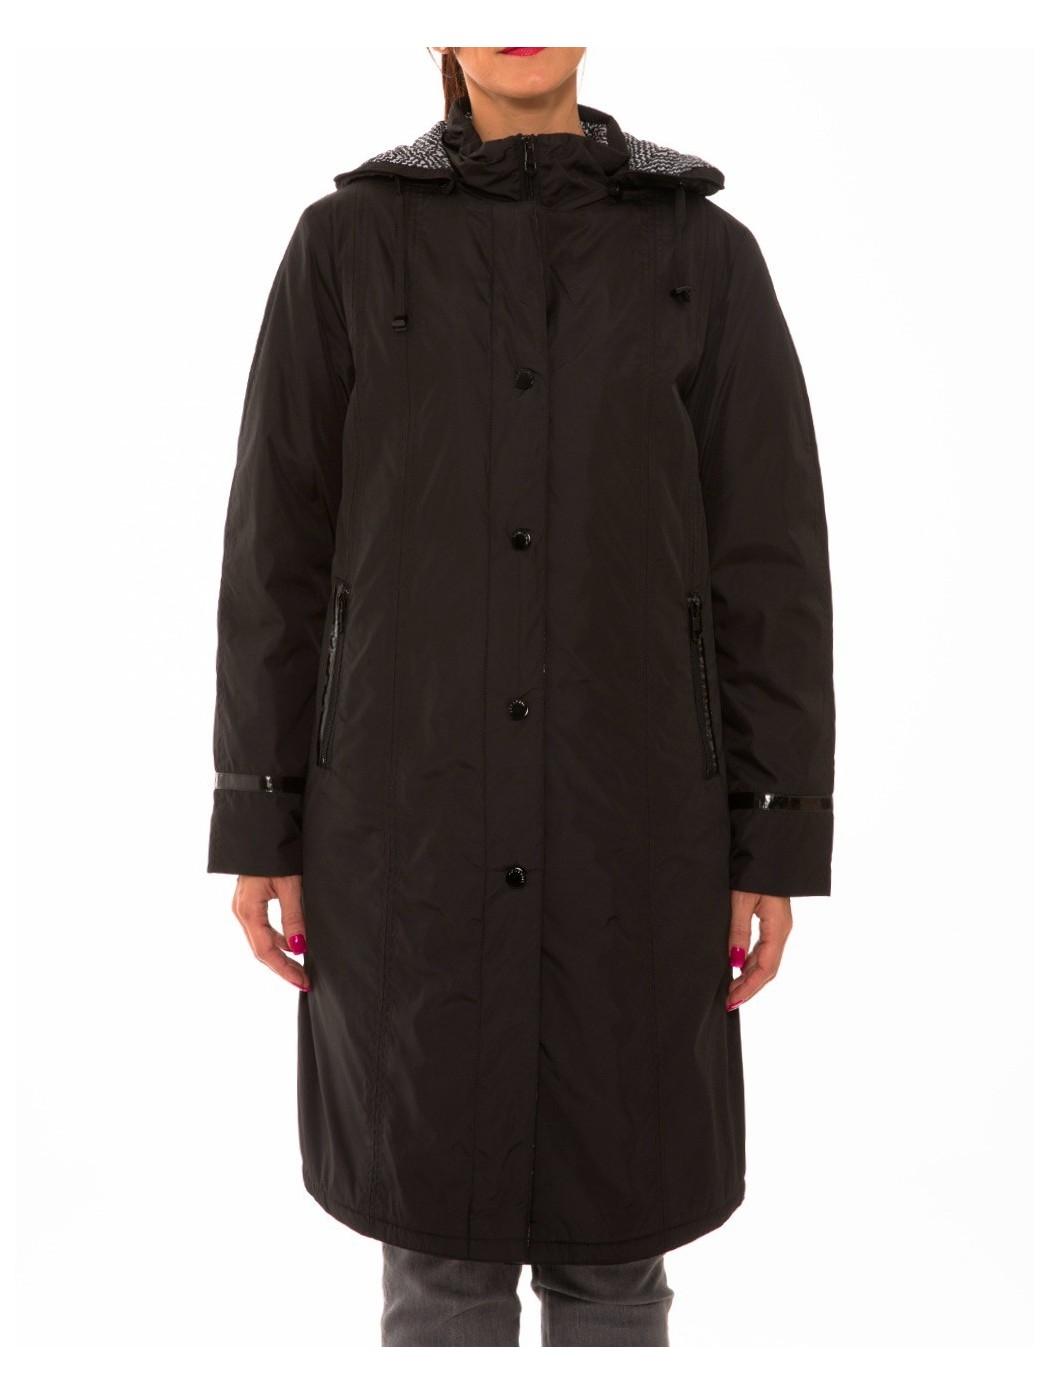 Concept K padded jacket